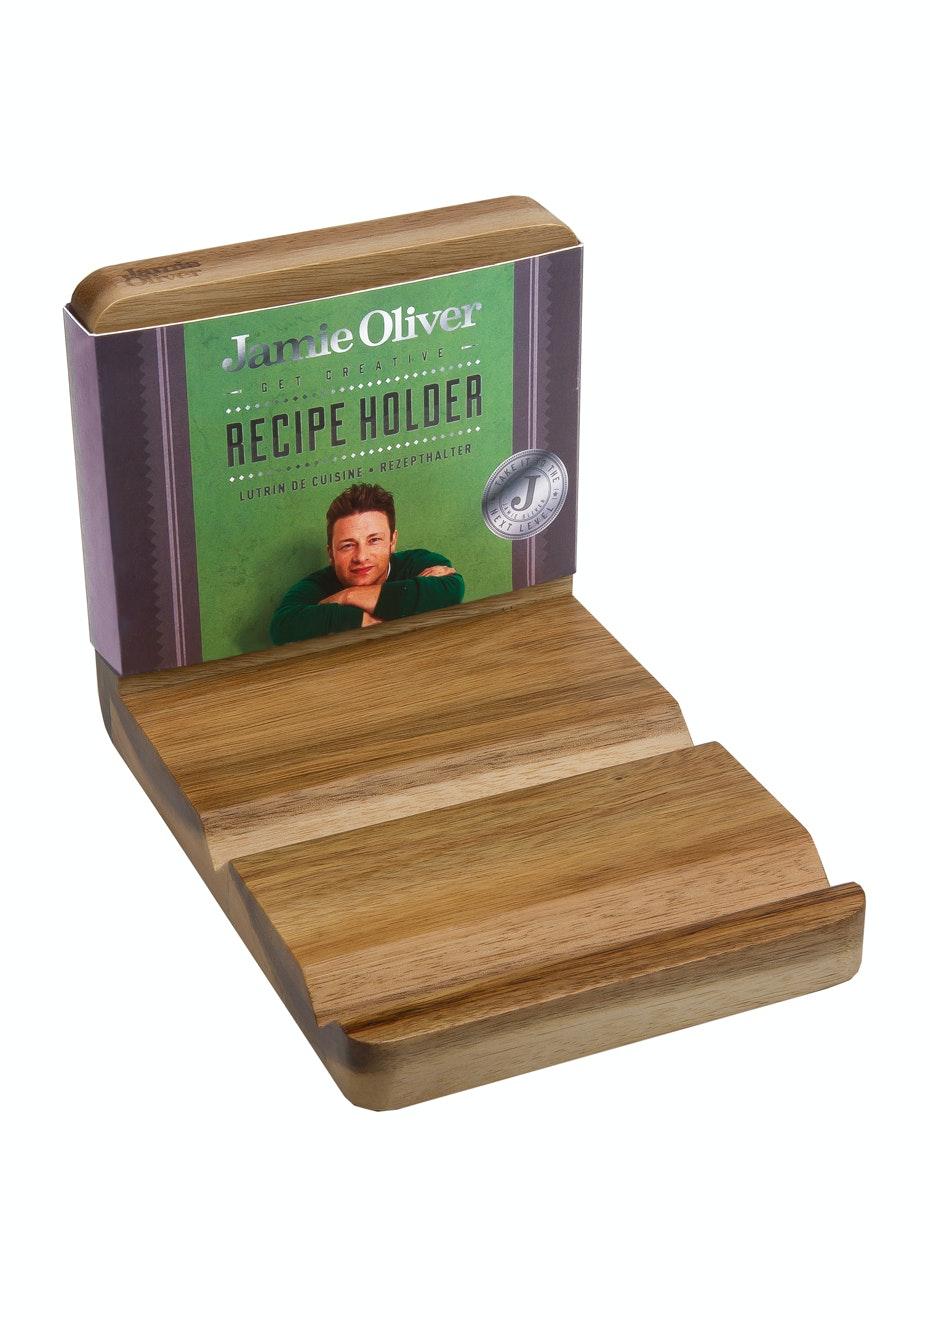 Jamie Oliver - Tablet and Recipe Book Holder